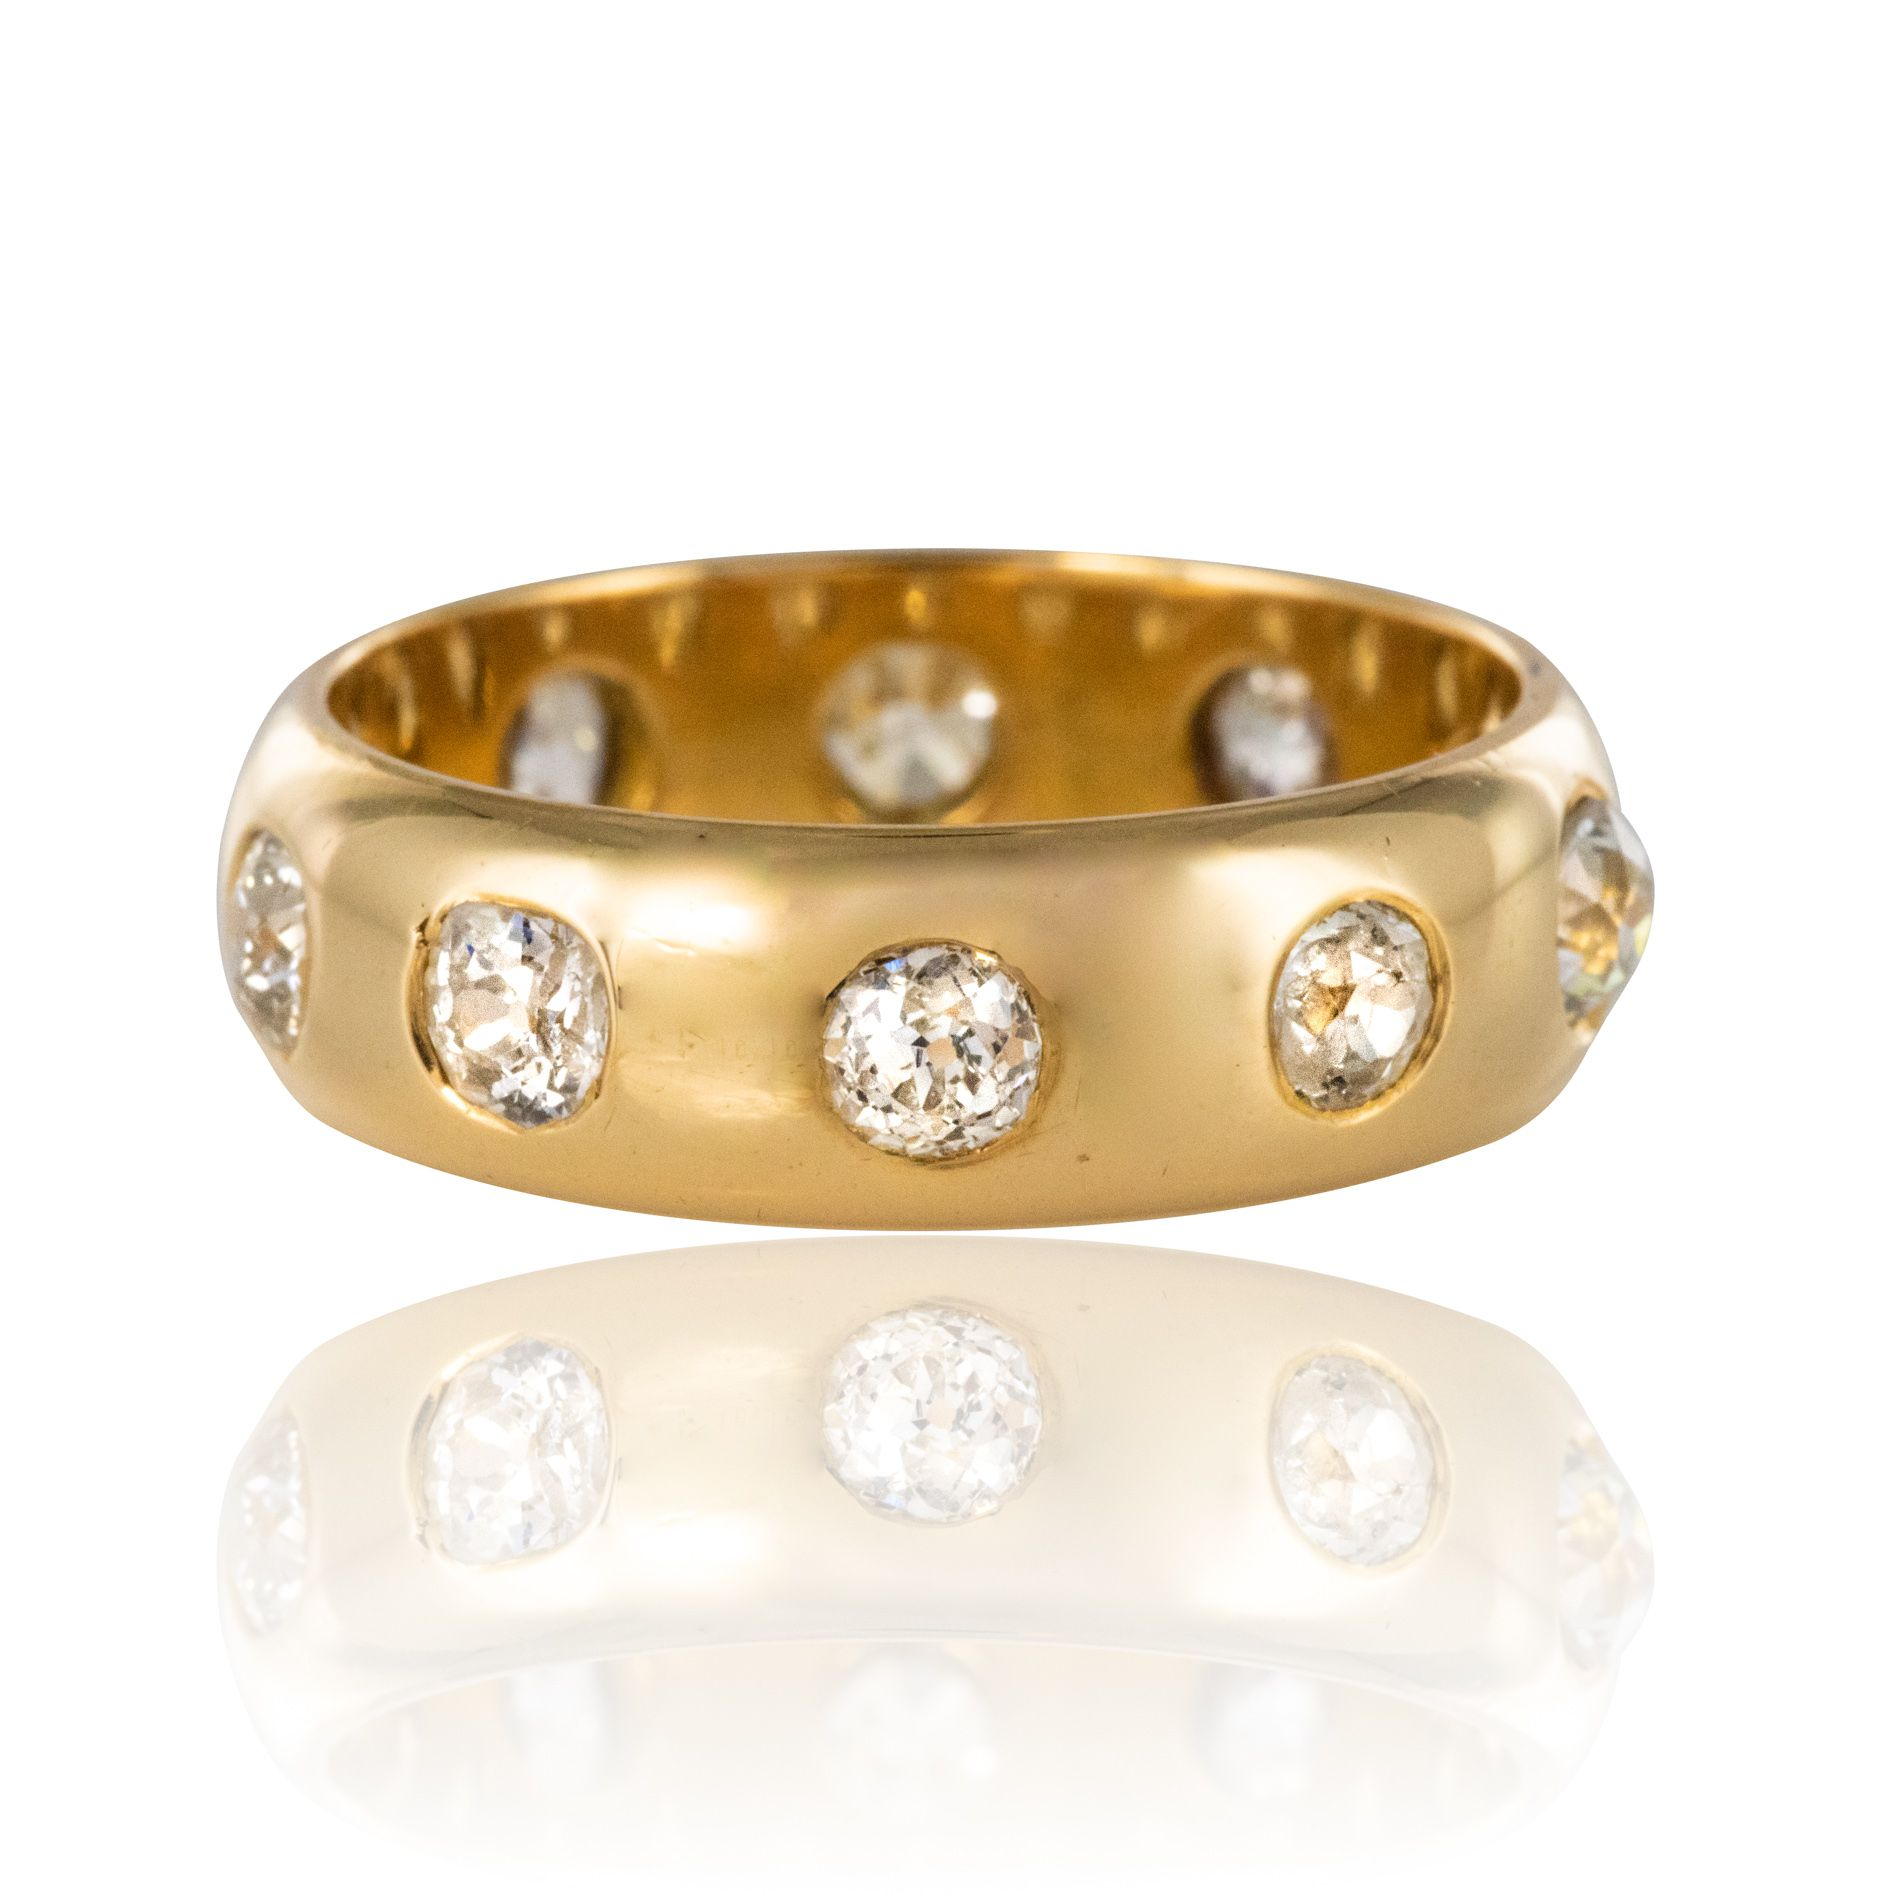 Alliance diamants or jaune bombée